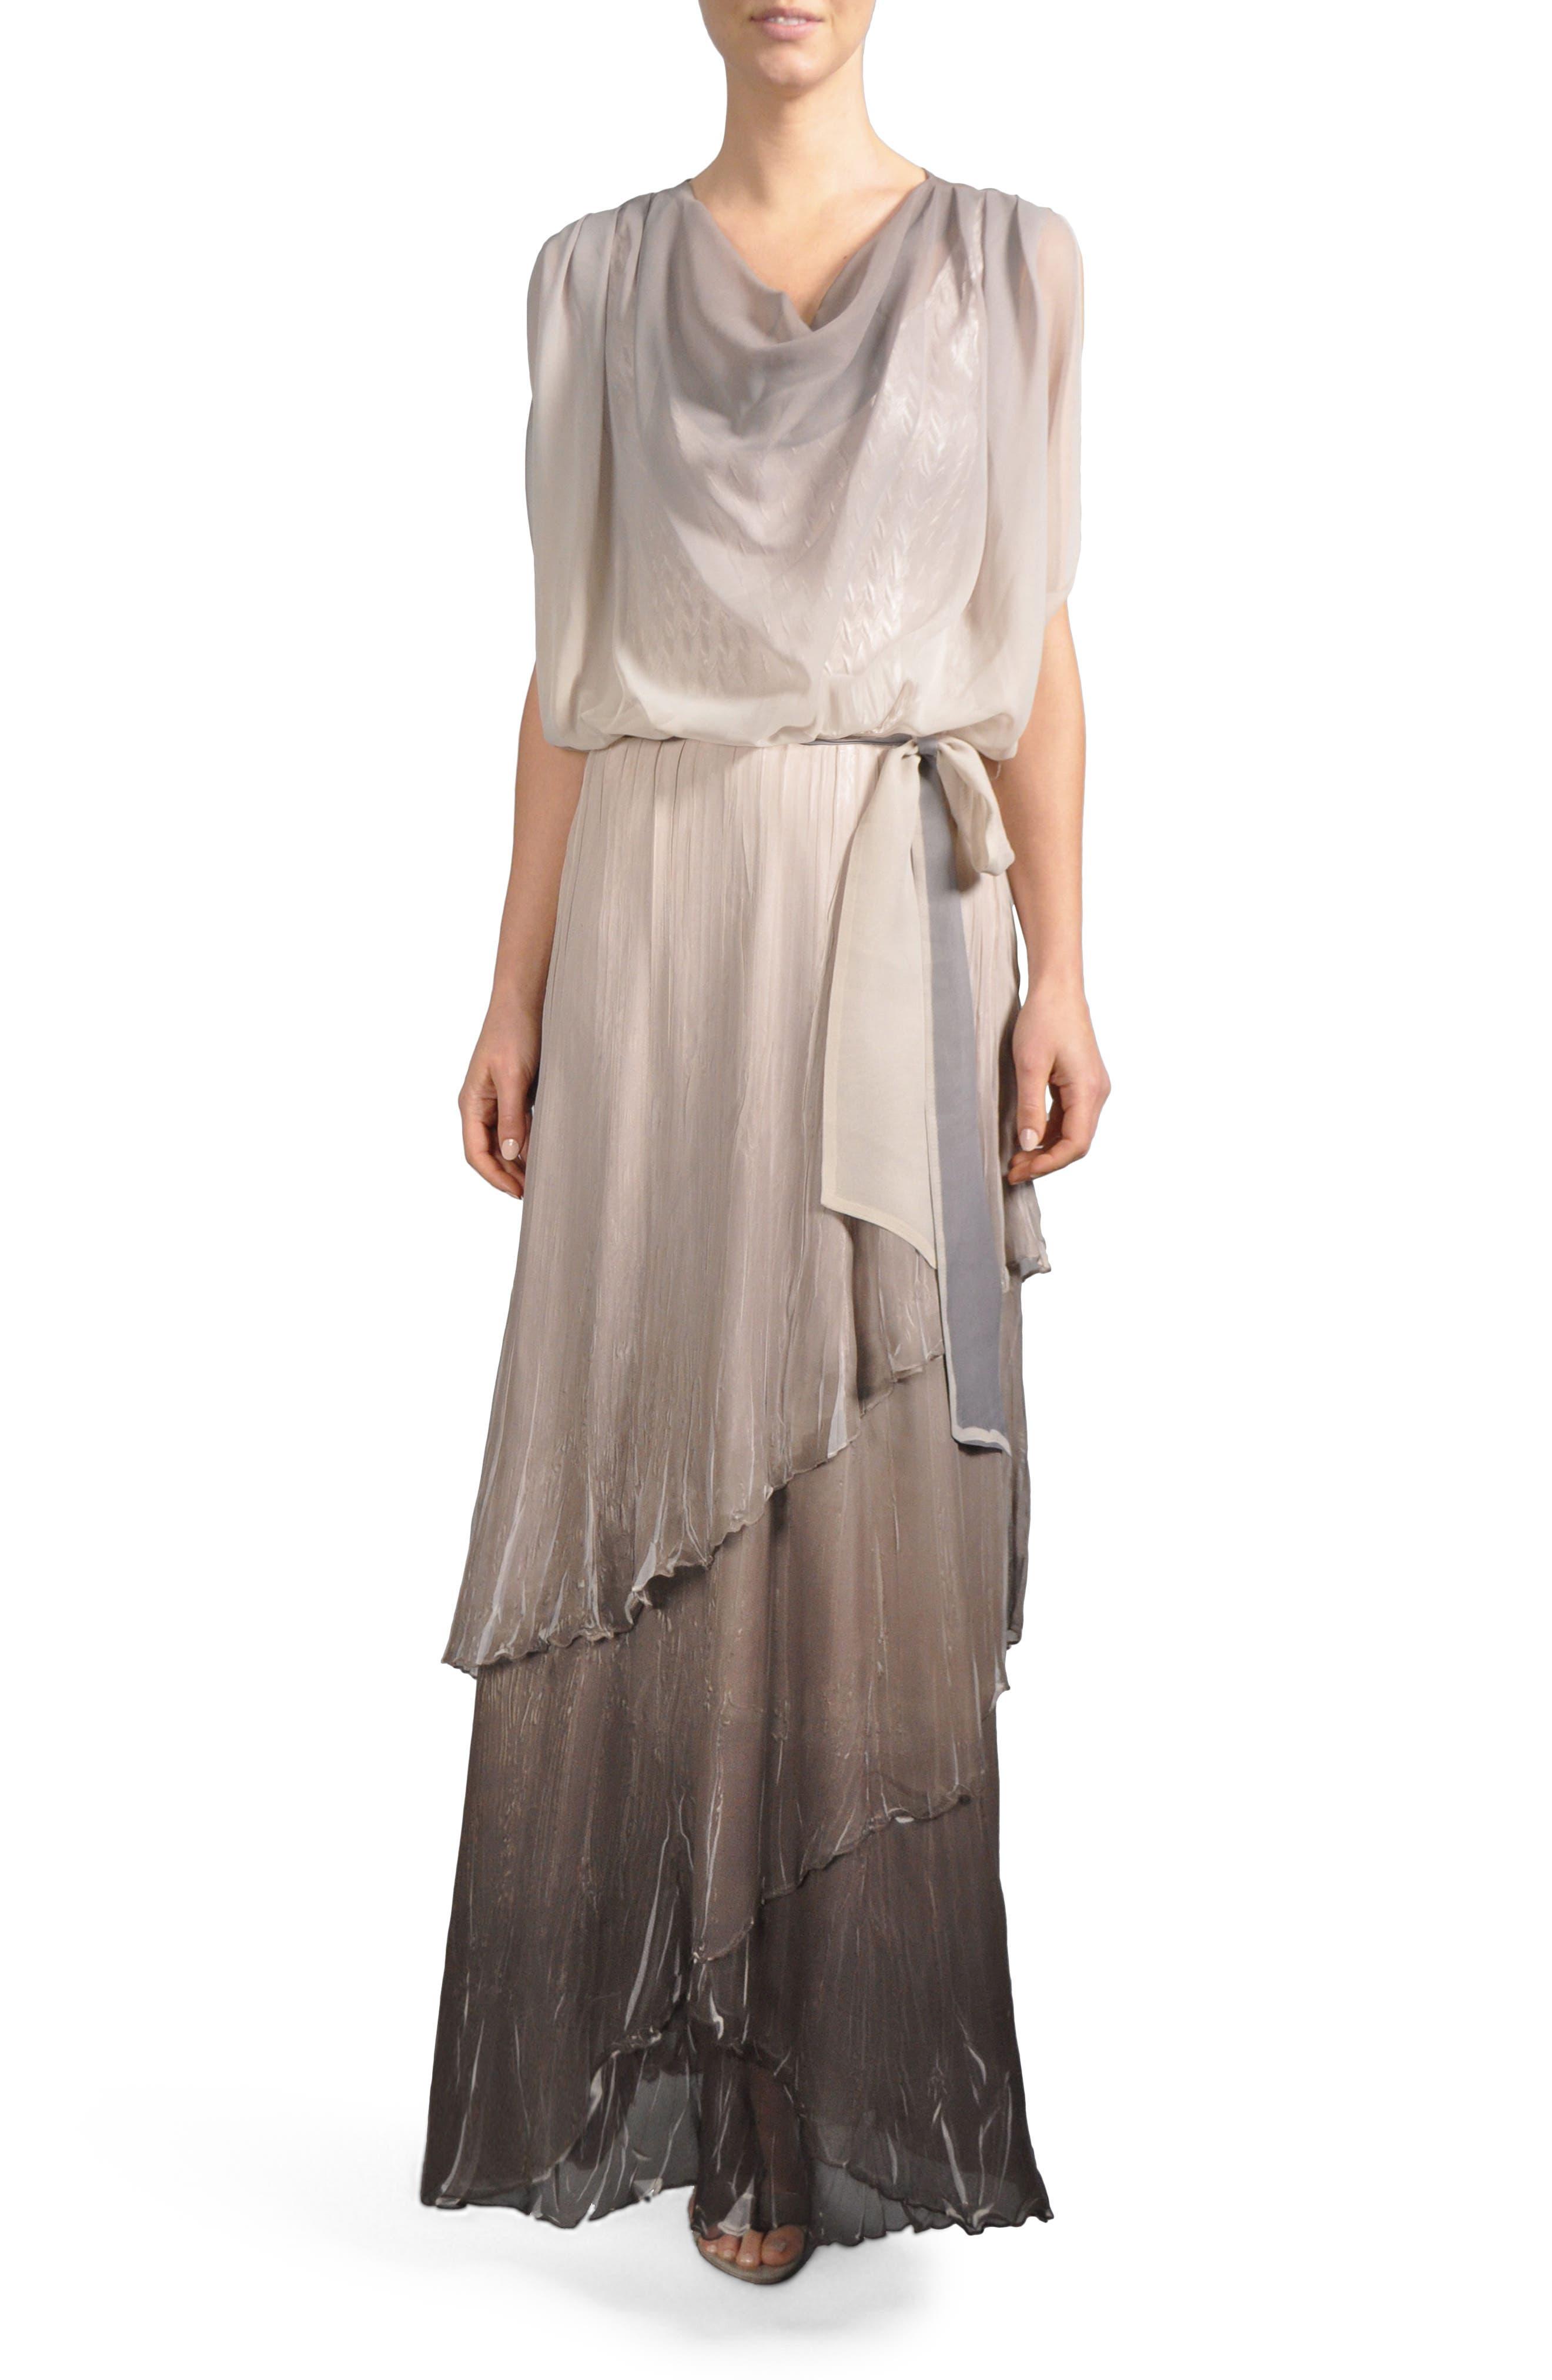 Main Image - Komarov Ombré Tiered Skirt Blouson Gown